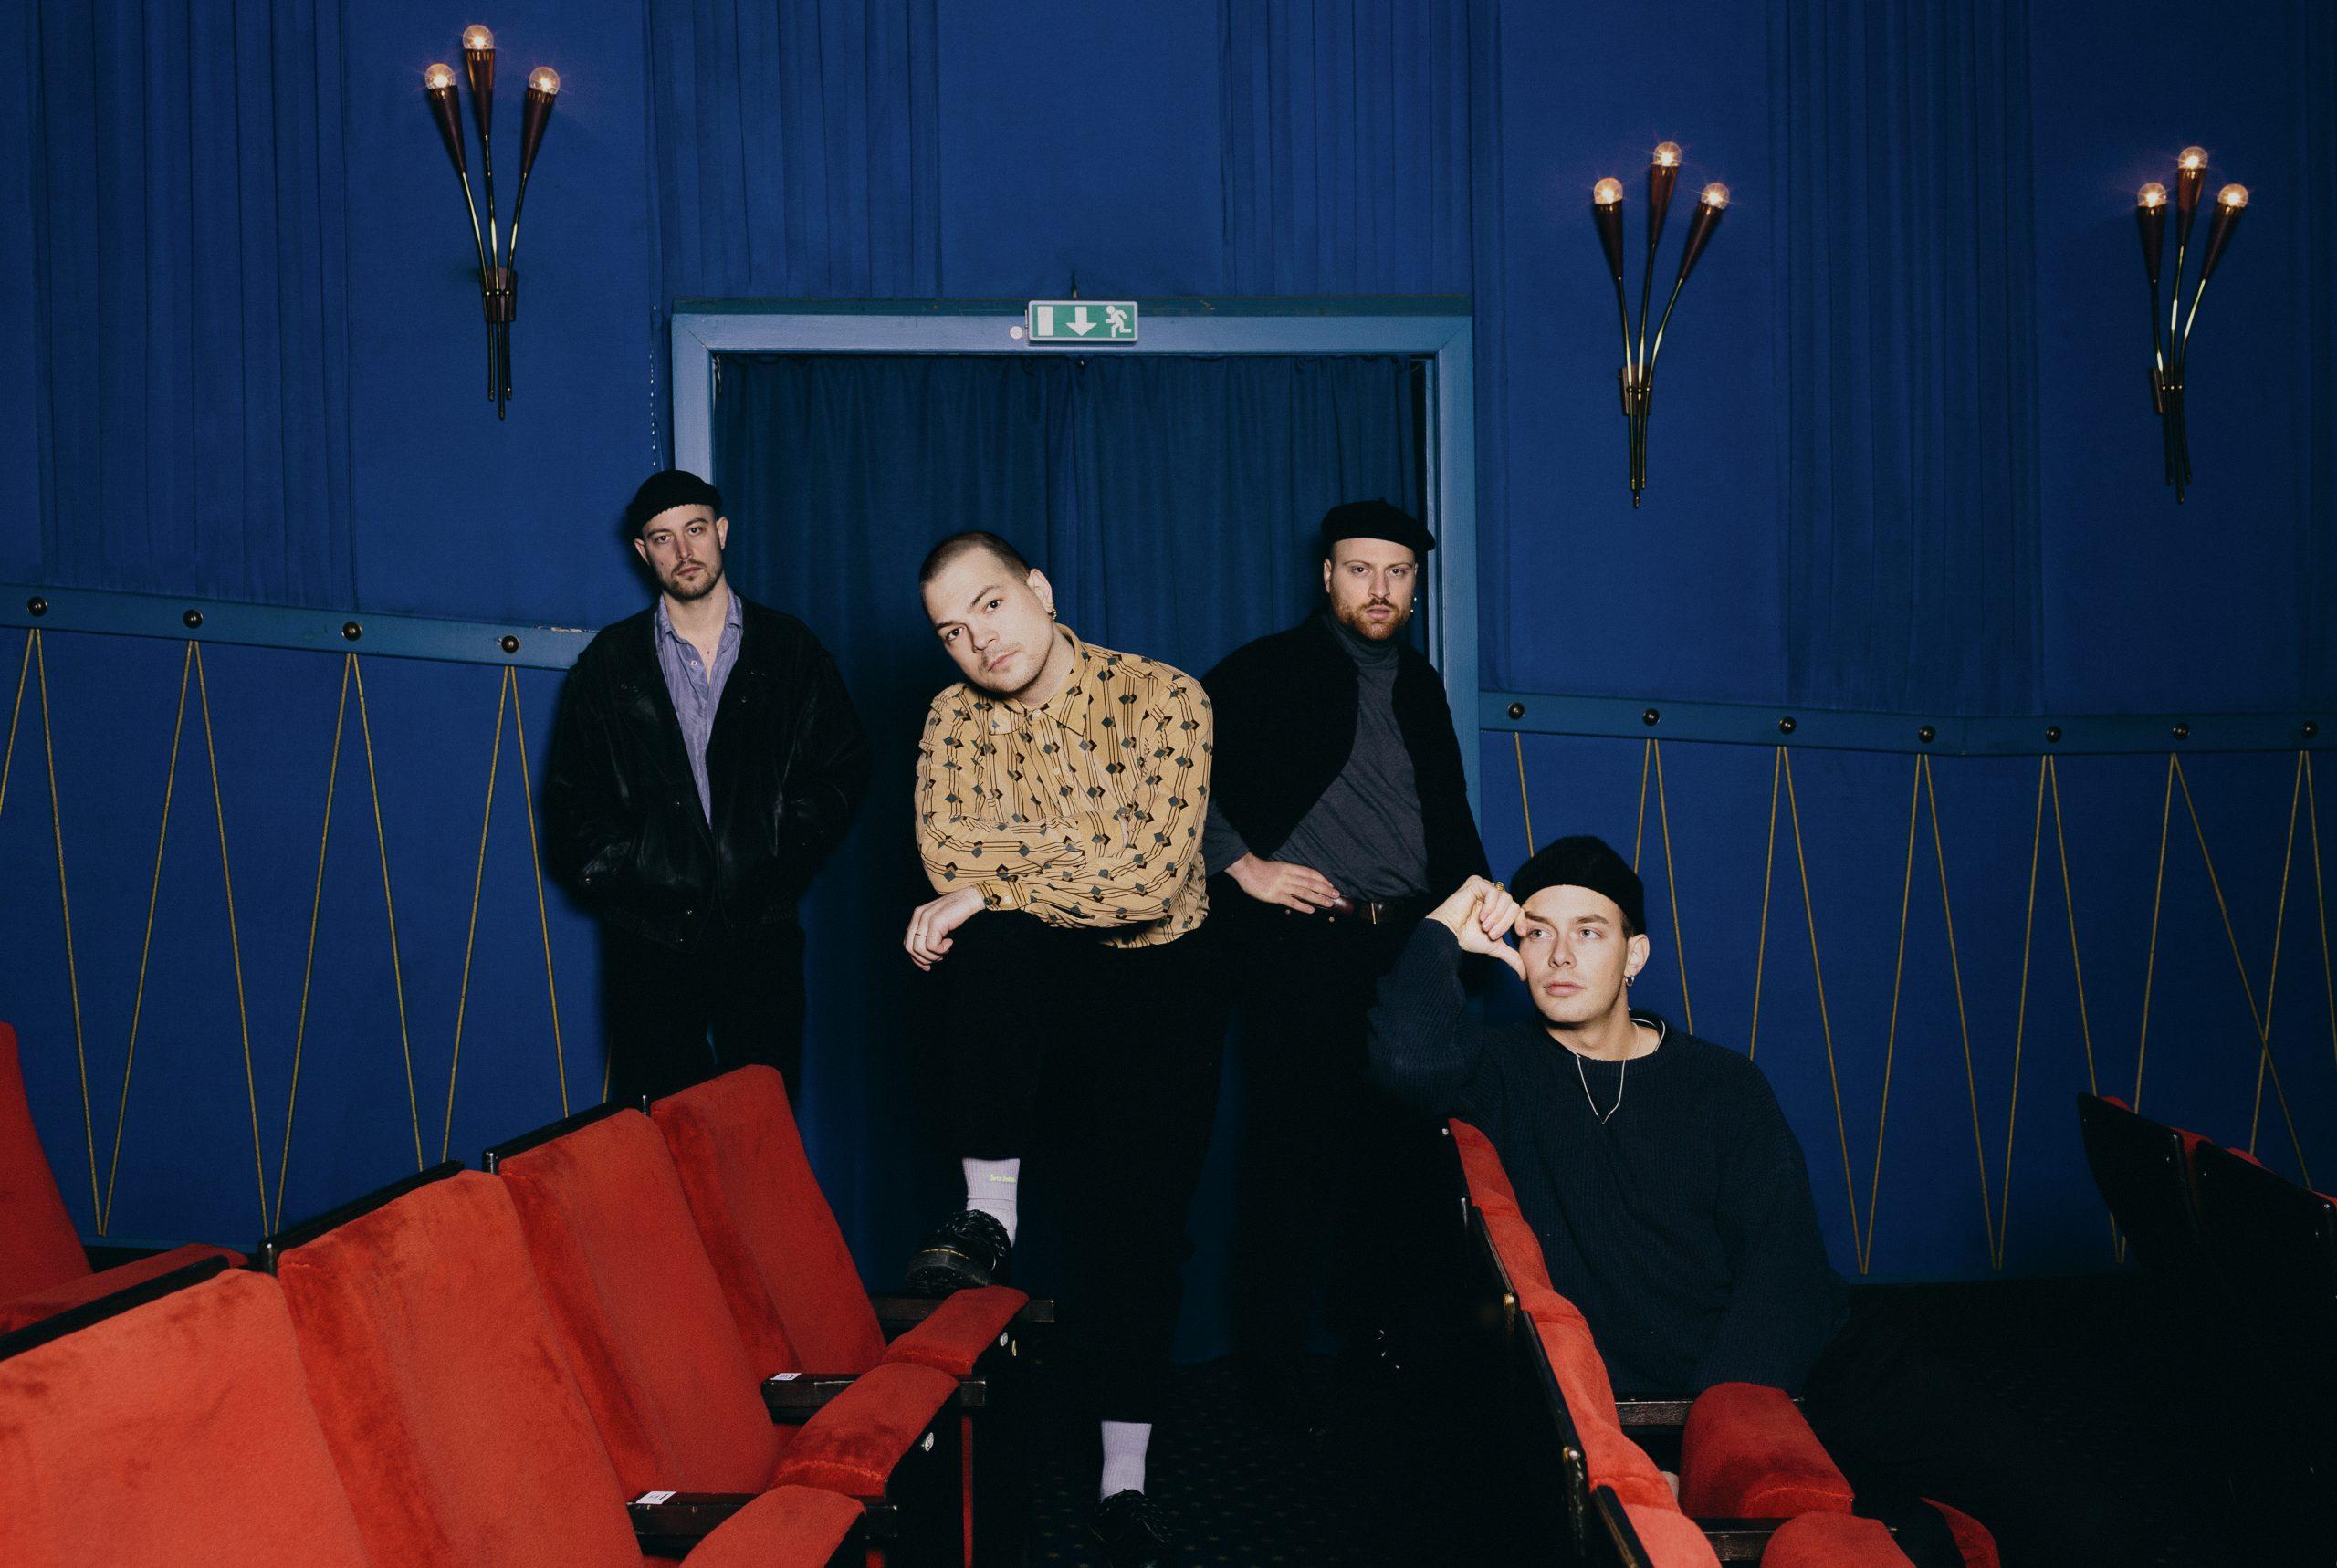 Fibel band live in Berlin